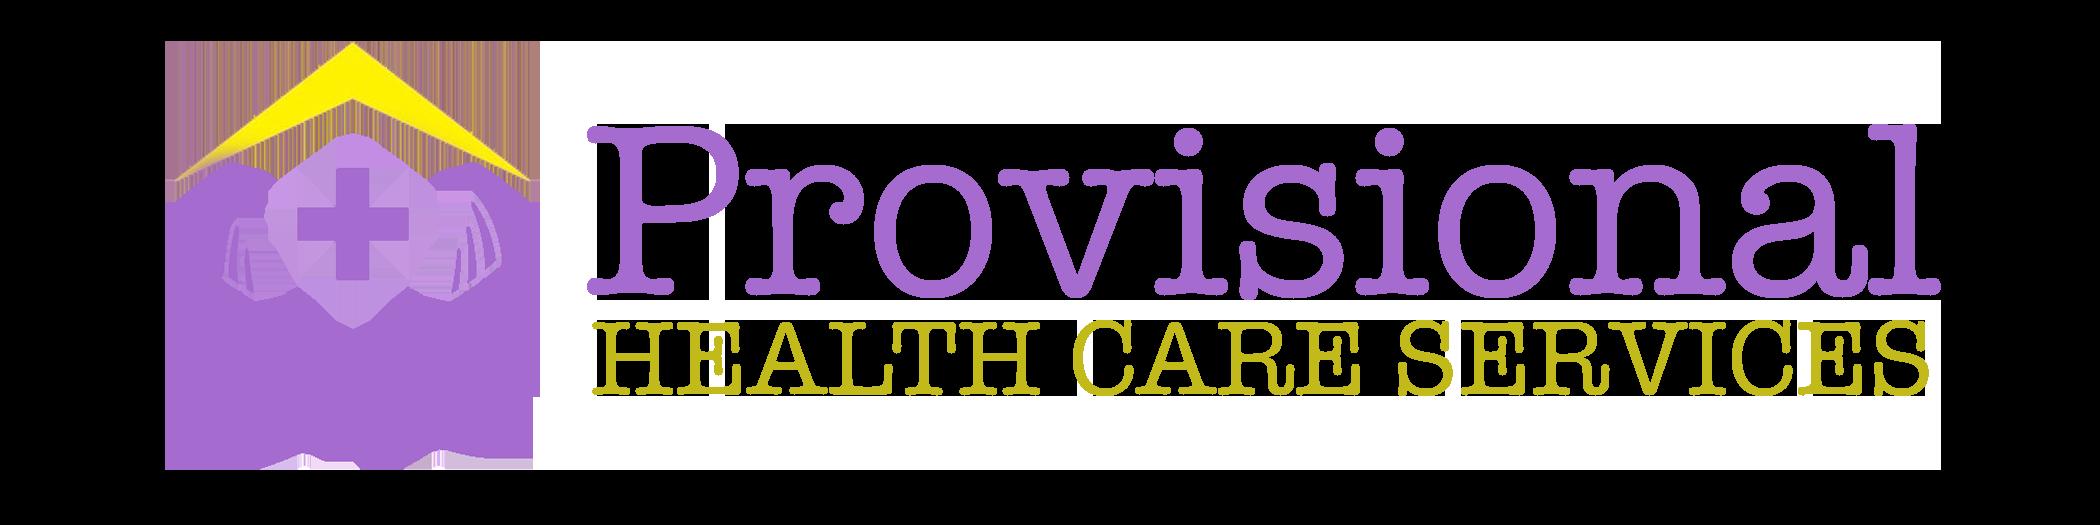 Provisional Health